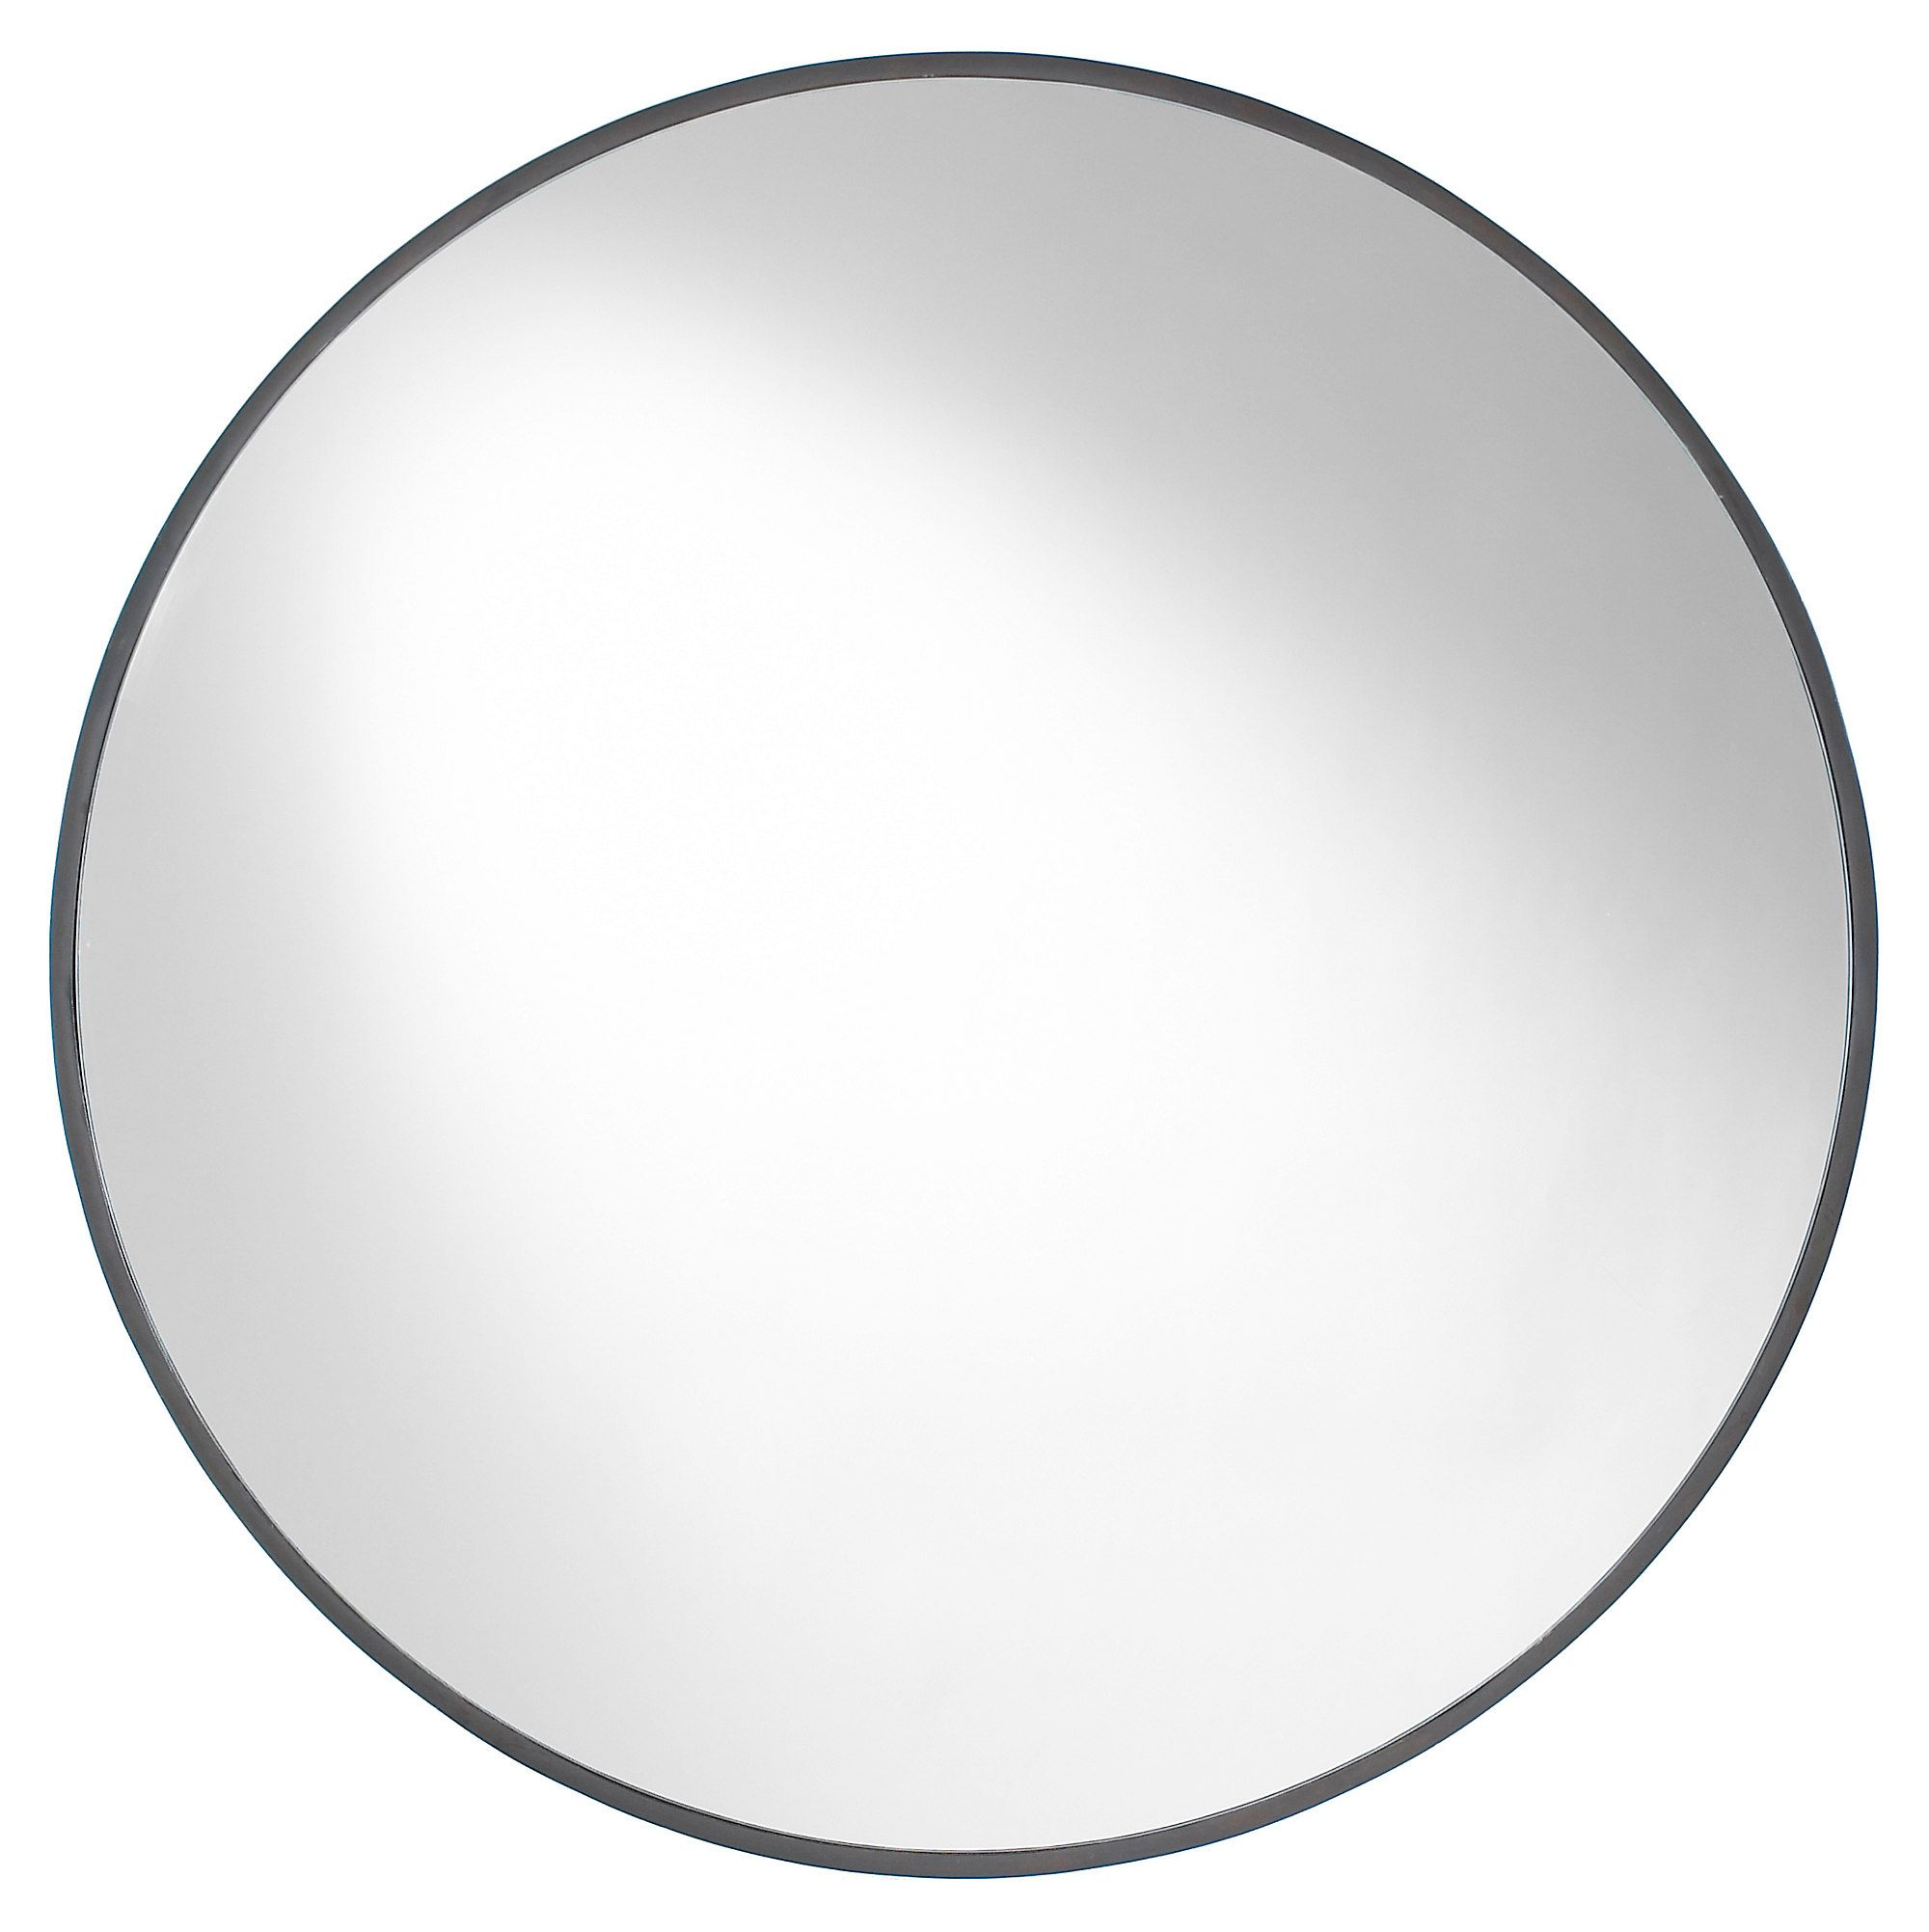 Amazing 30 Inch Round Mirror Part - 1: A Slim Frame Of Mocha-brown Birch Encircles This Round Mirror For A Subtleu2026